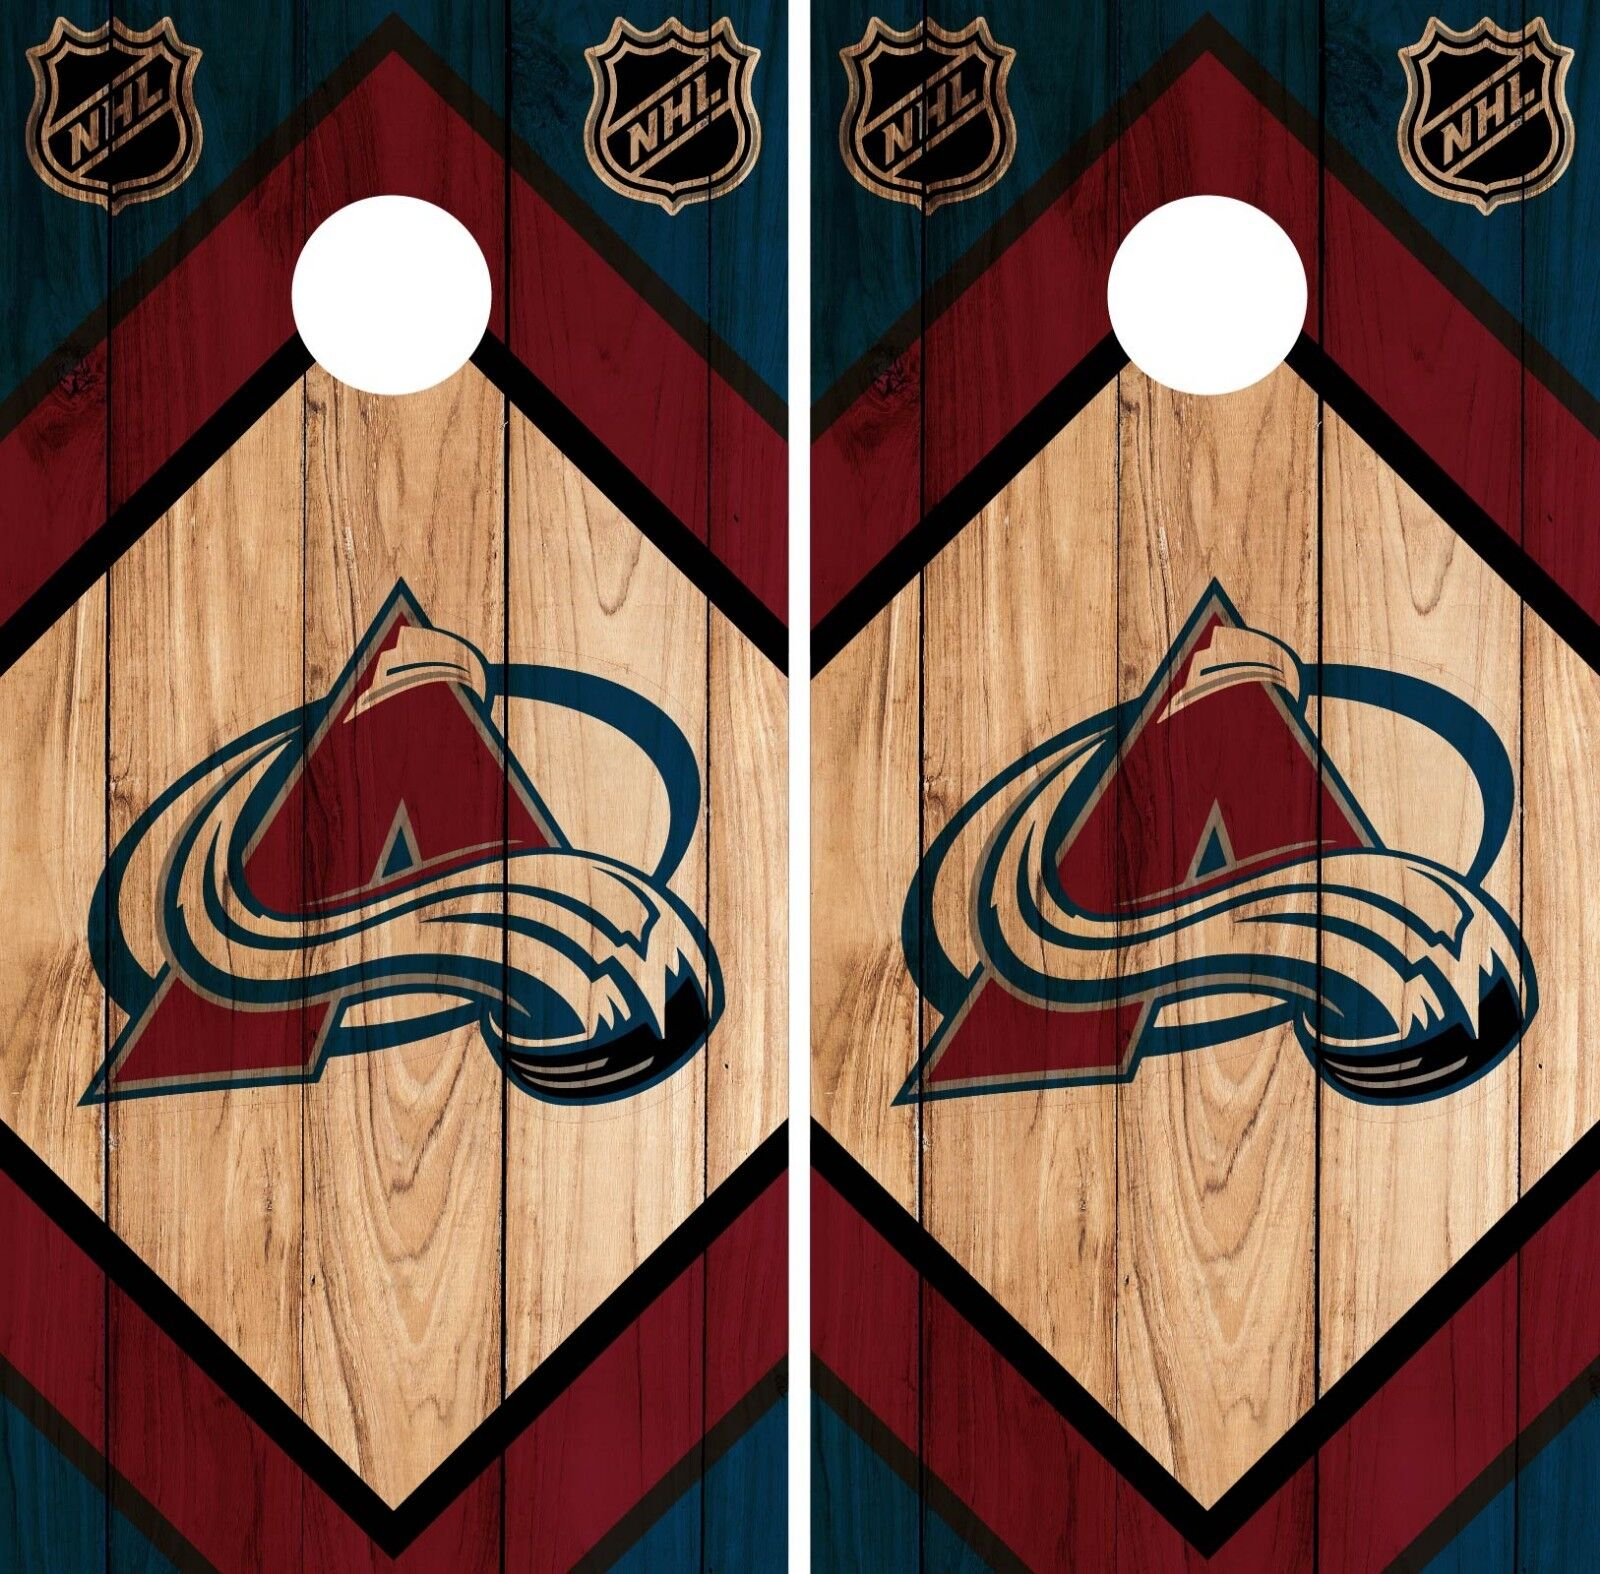 colorado Avalanche Cornhole Wrap NHL Game Board Skin Set Vinyl Decal CO333